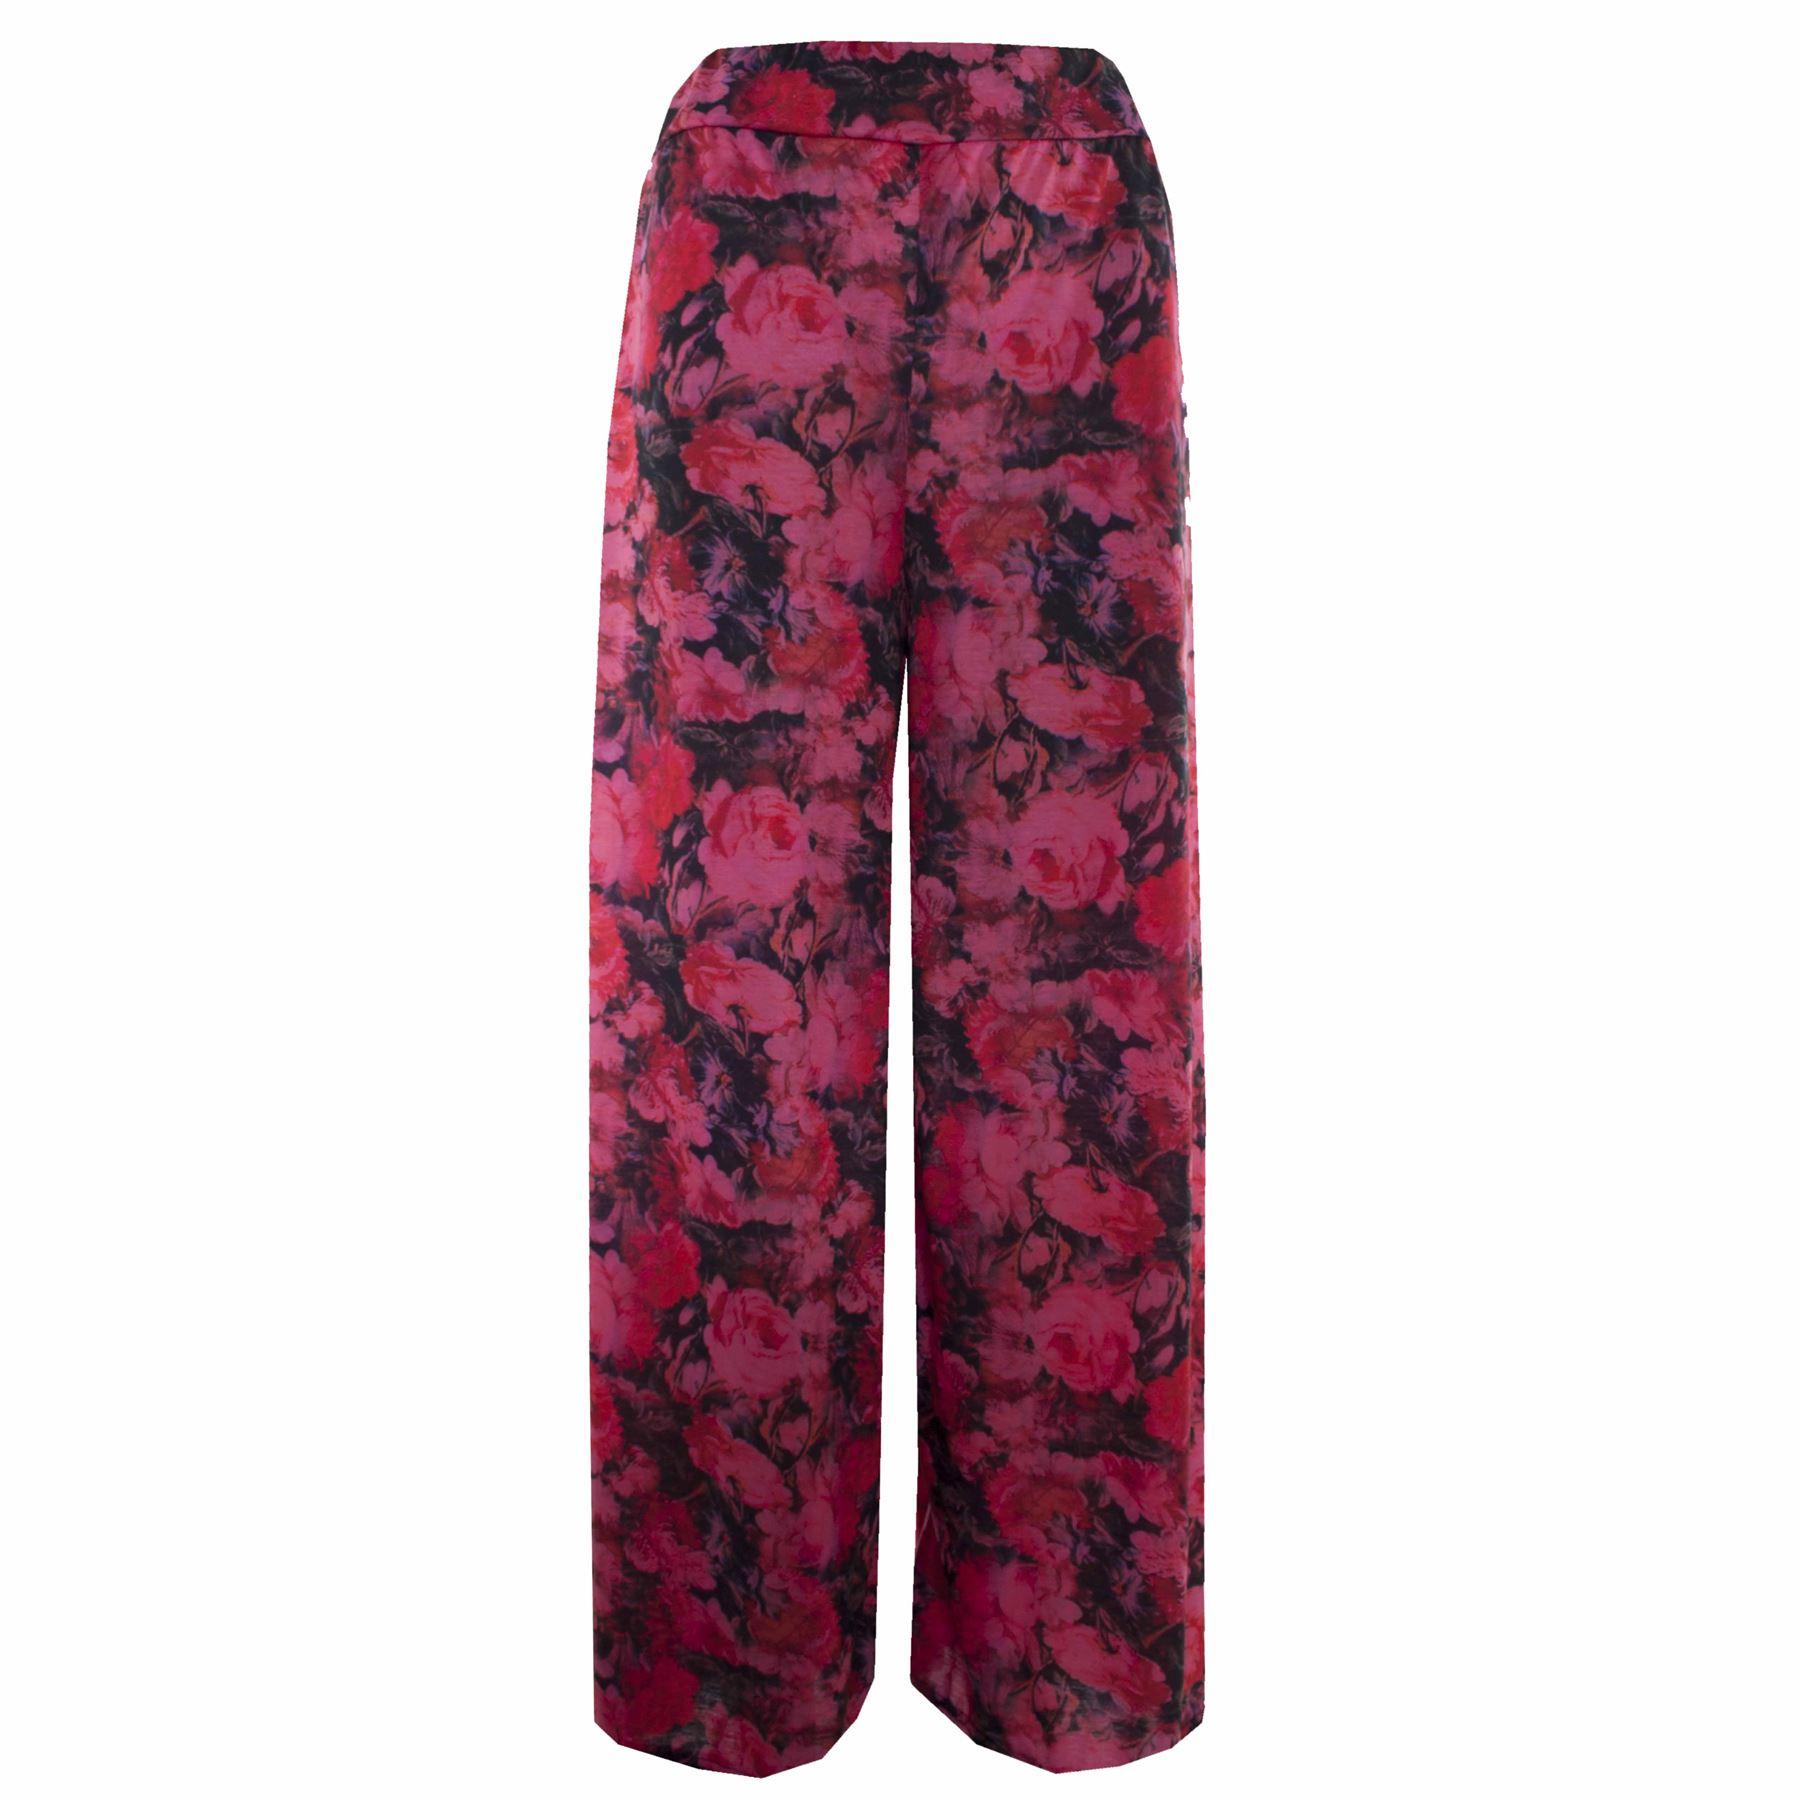 Womens-Floral-Print-Palazzo-Trousers-Ladies-Wide-Leg-Flared-Loose-Pants-Leggings